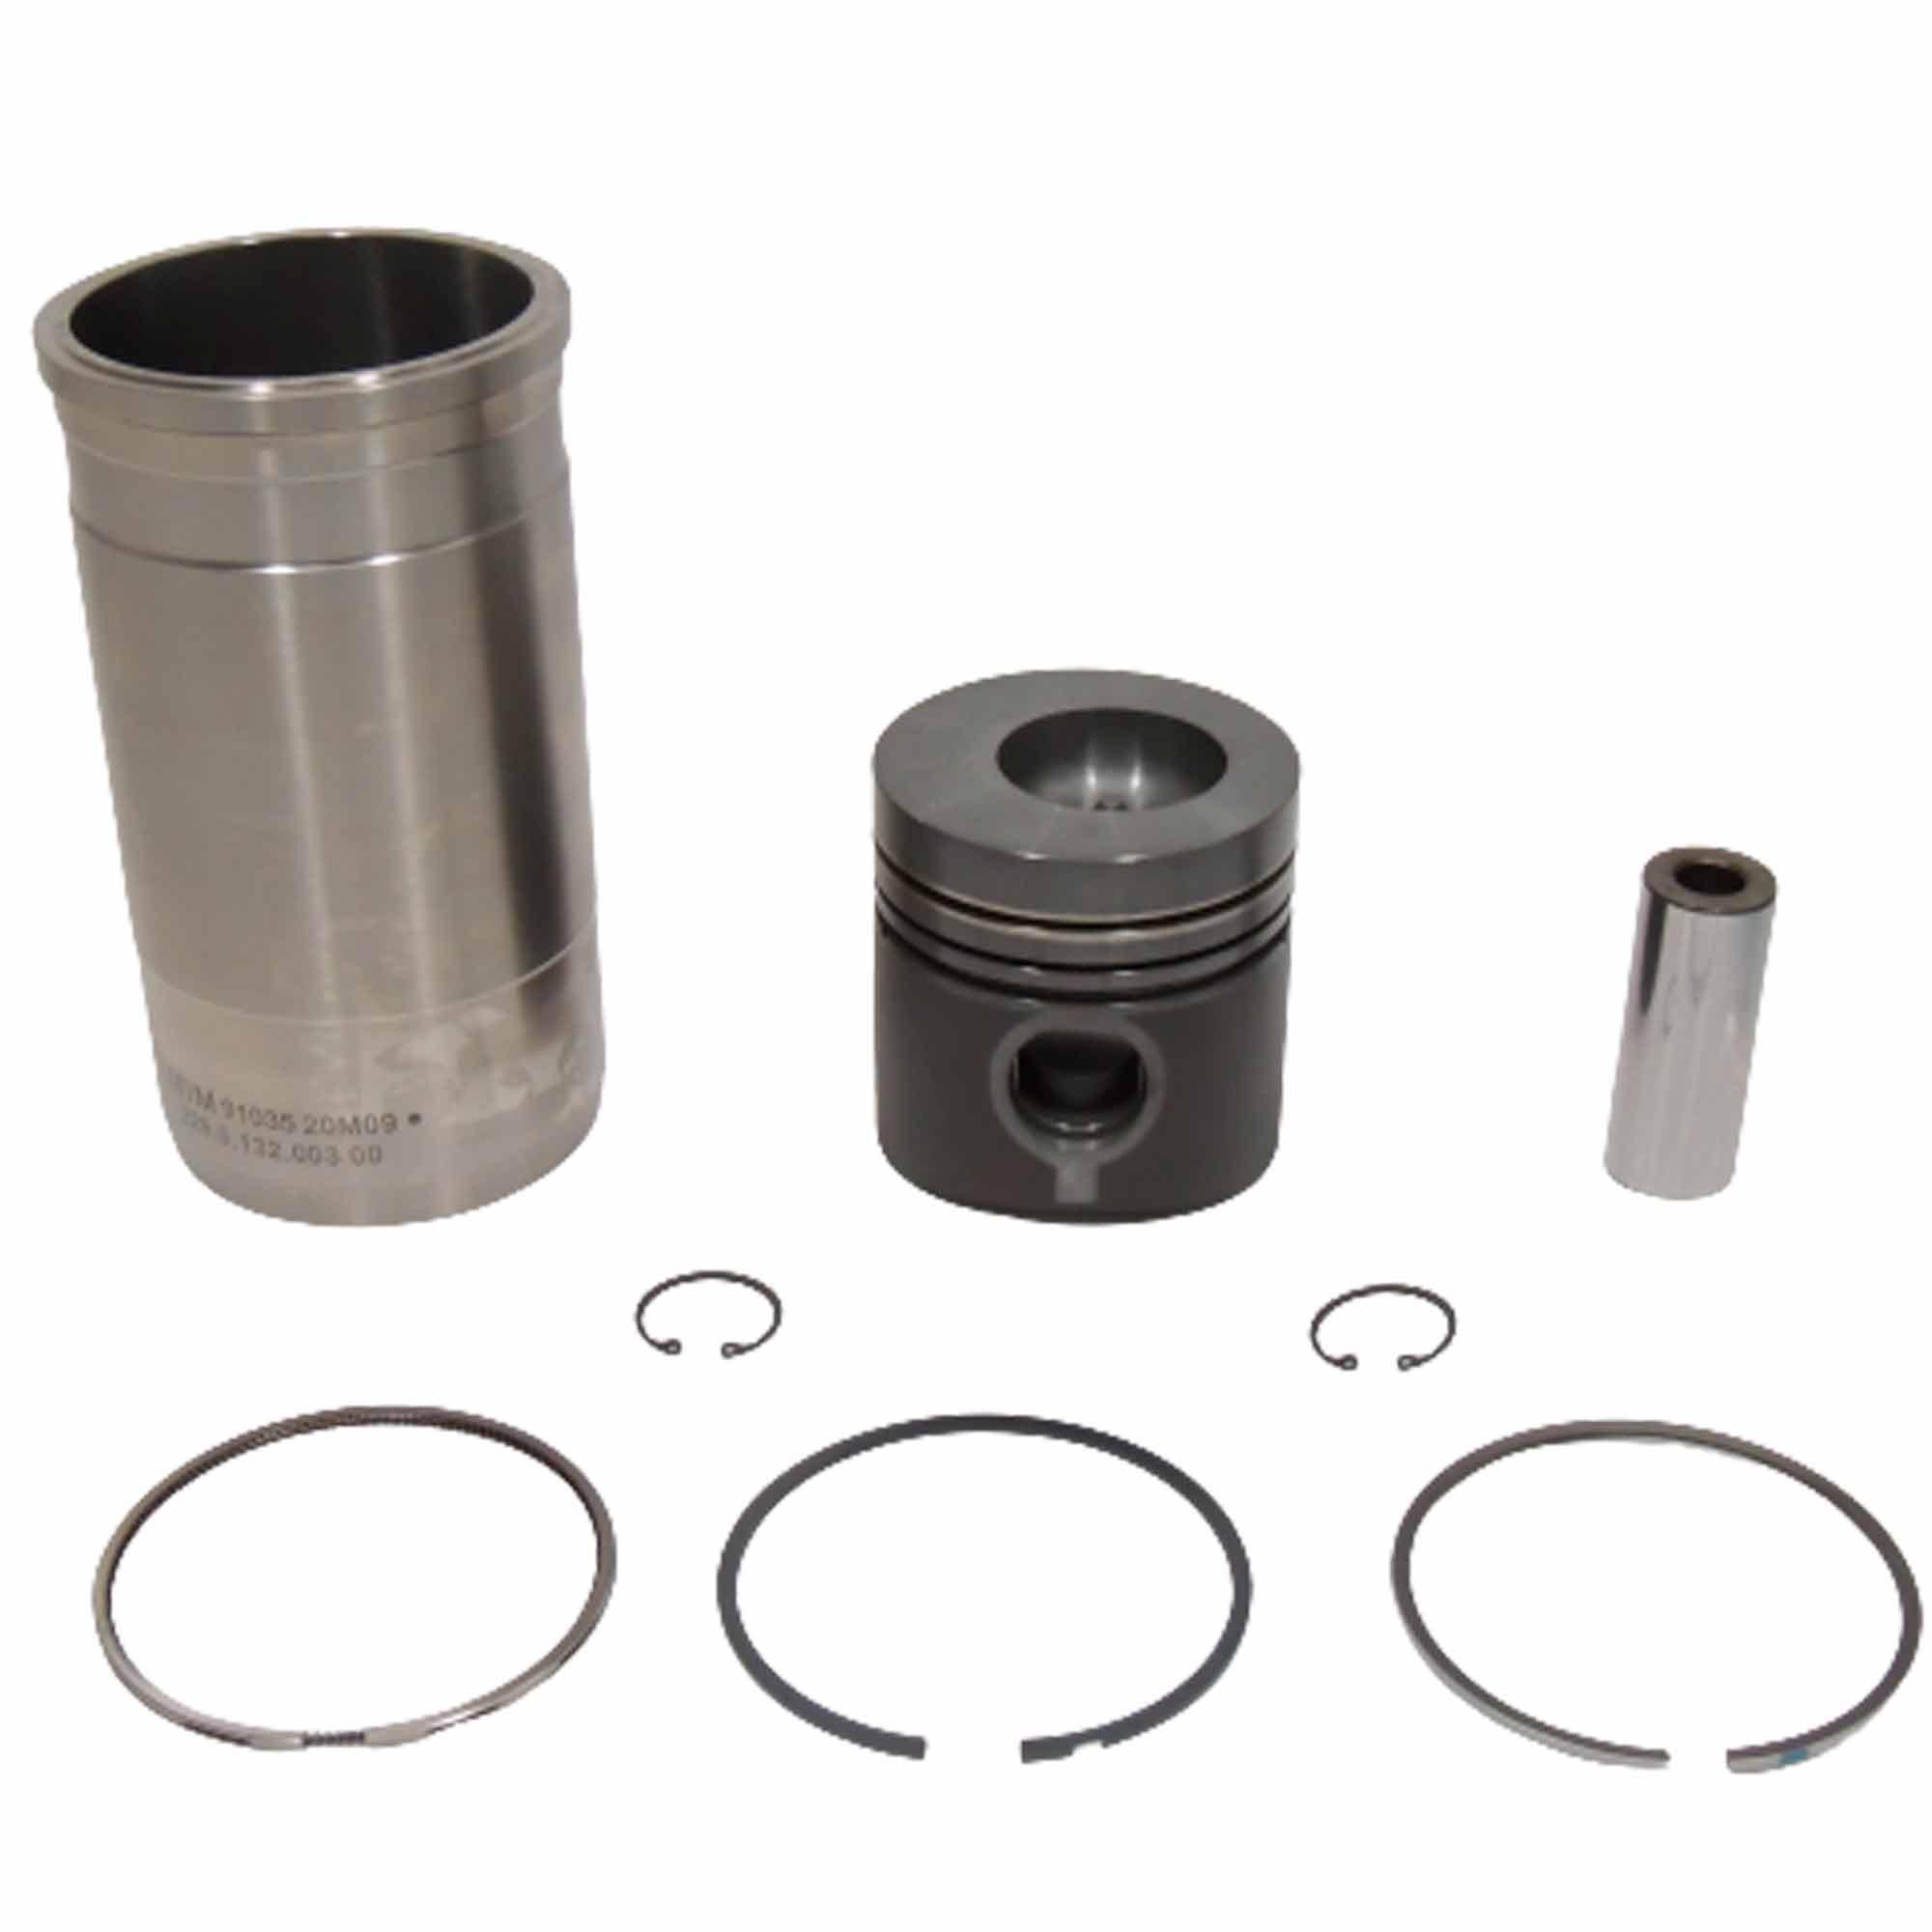 922980191428 - Kit de reparo para 1 cilindro